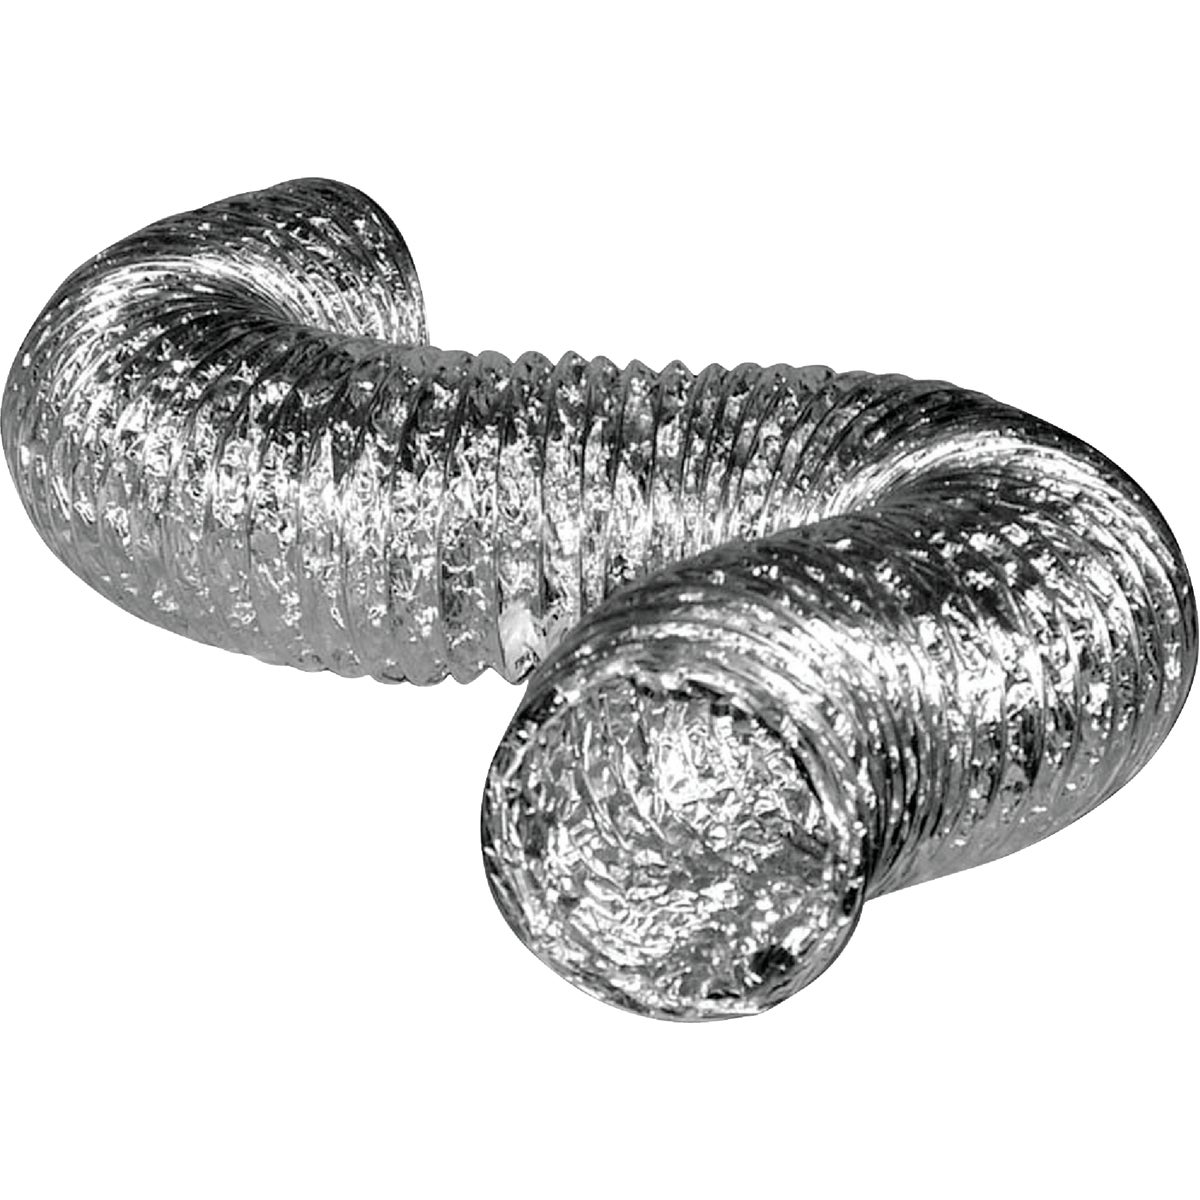 Dundas Jafine UL Aluminum Foil Flexible Ducting